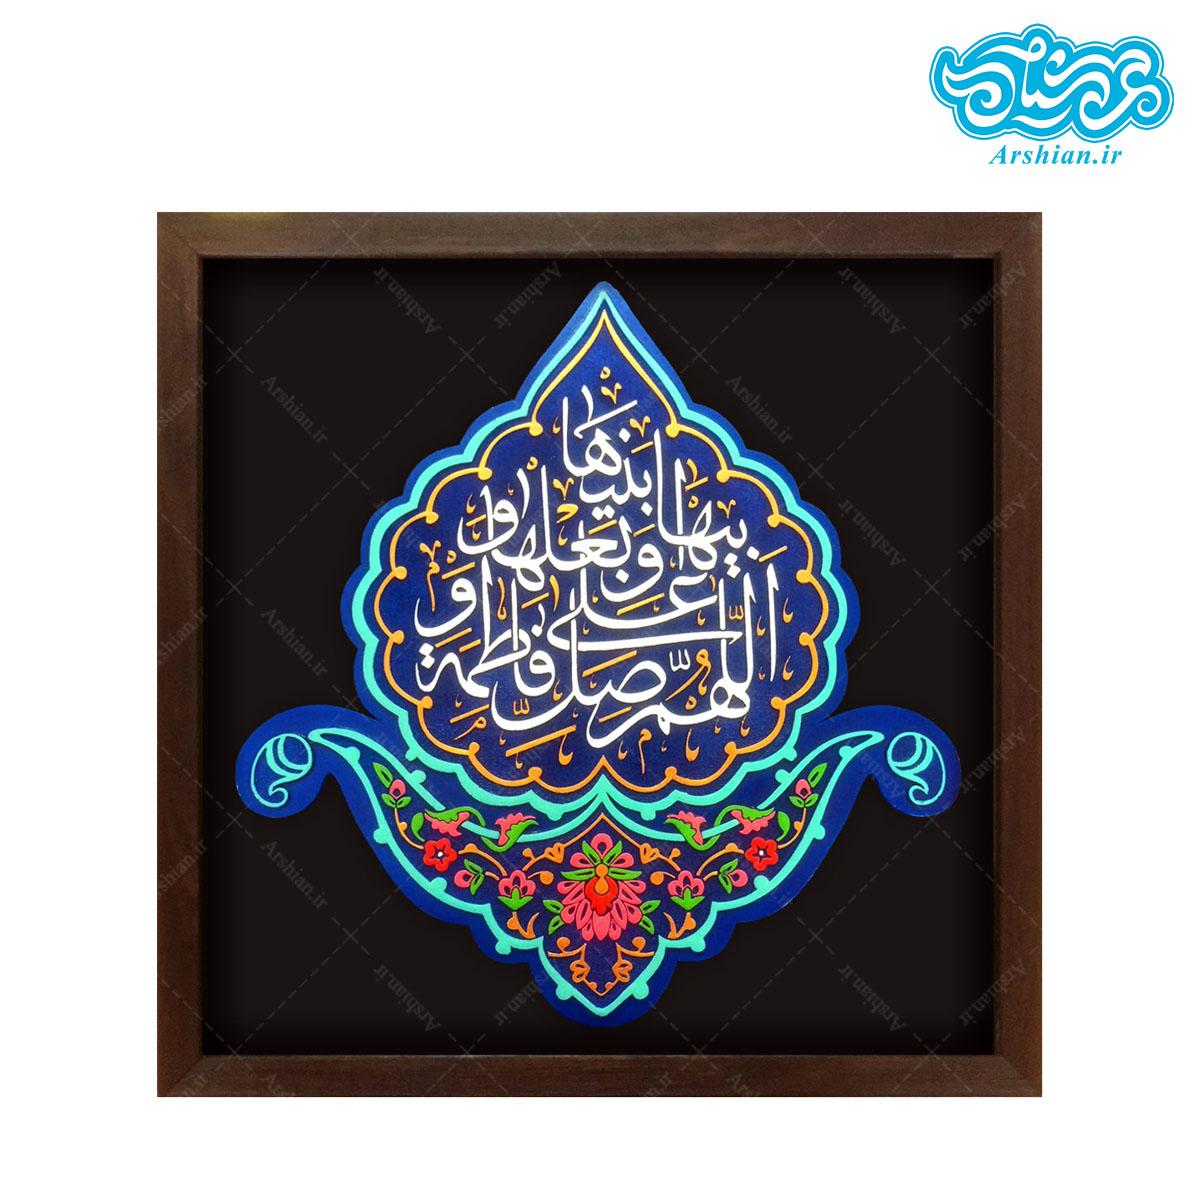 تابلو برجسته طرح صلوات حضرت فاطمه سلام الله علیها کد ۱۶۲